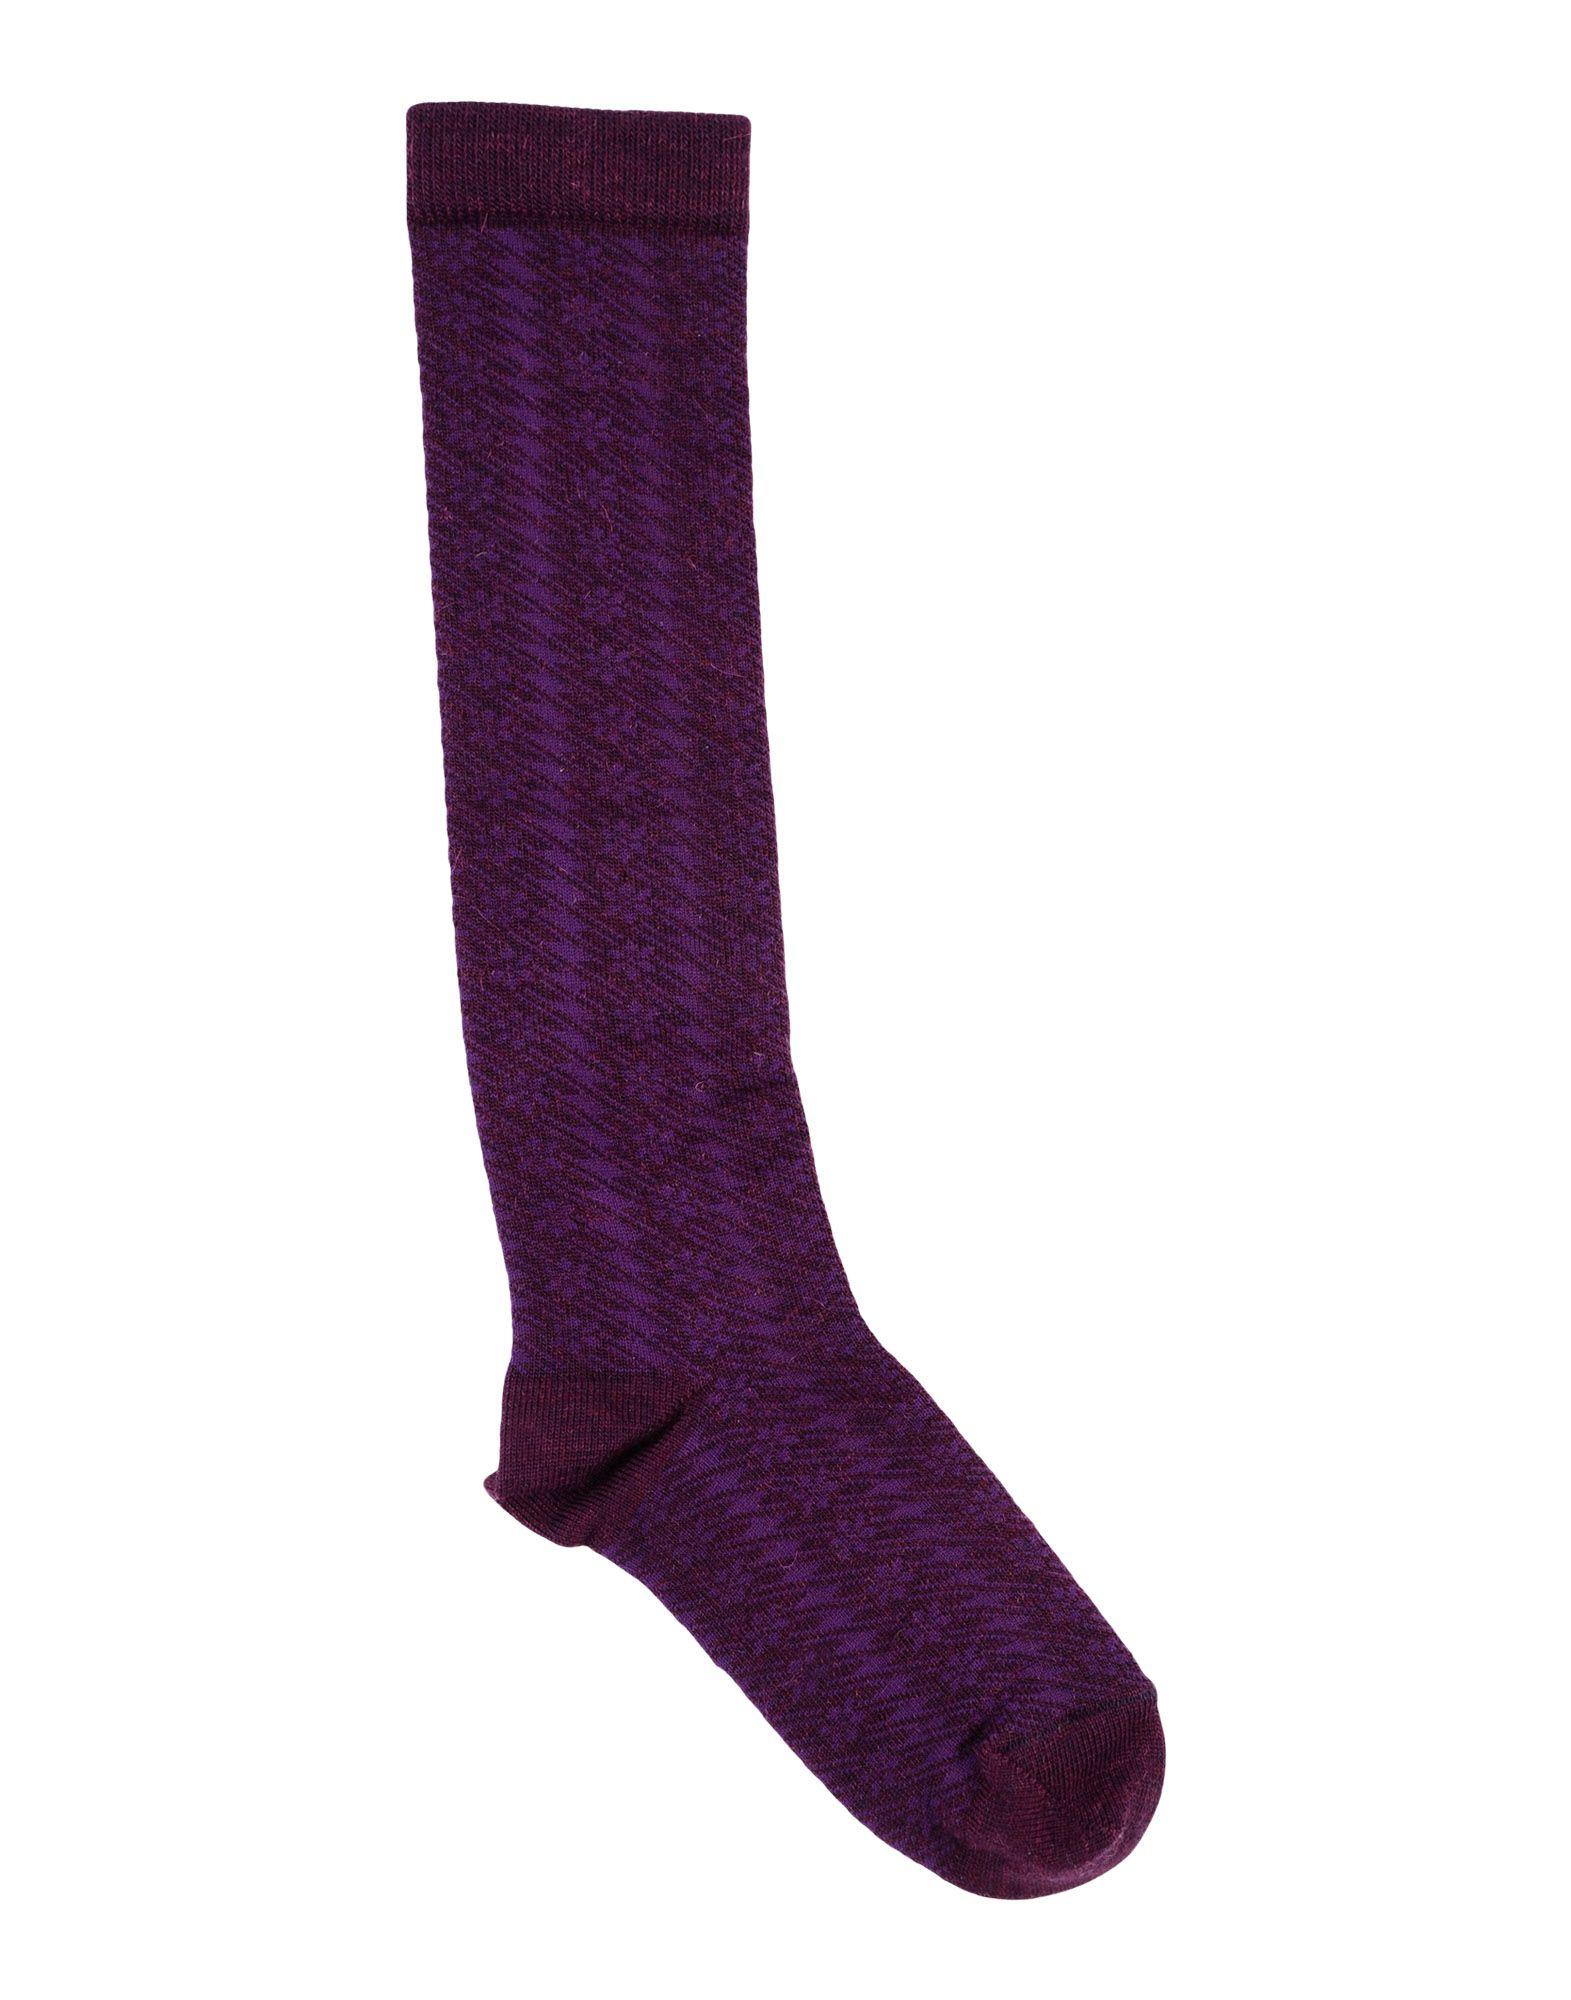 RITA CO RITA Короткие носки боди rita xxl 3xl